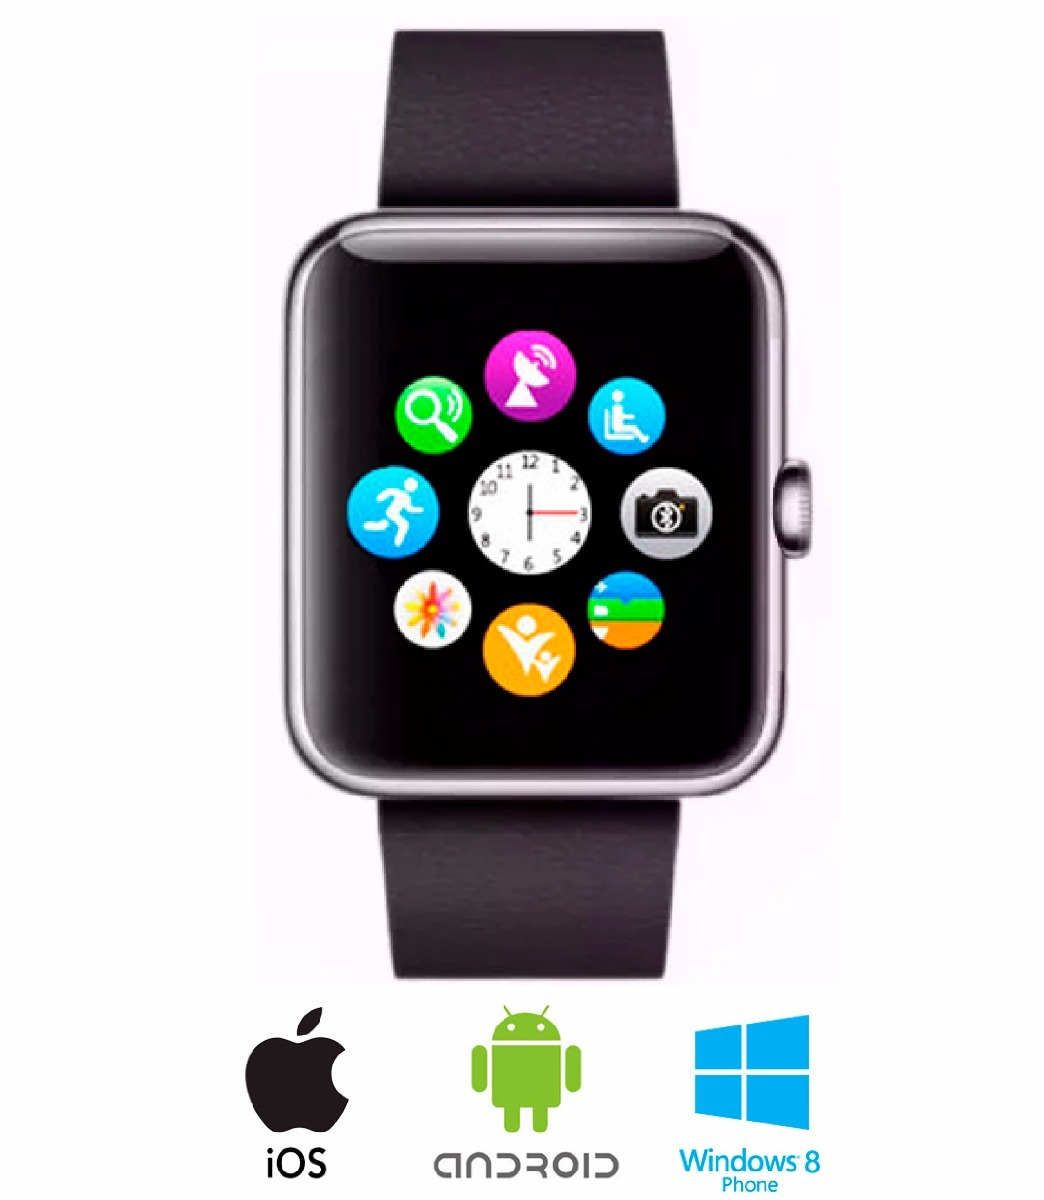 nuevo smartwatch reloj inteligente 2018 android apple. Black Bedroom Furniture Sets. Home Design Ideas